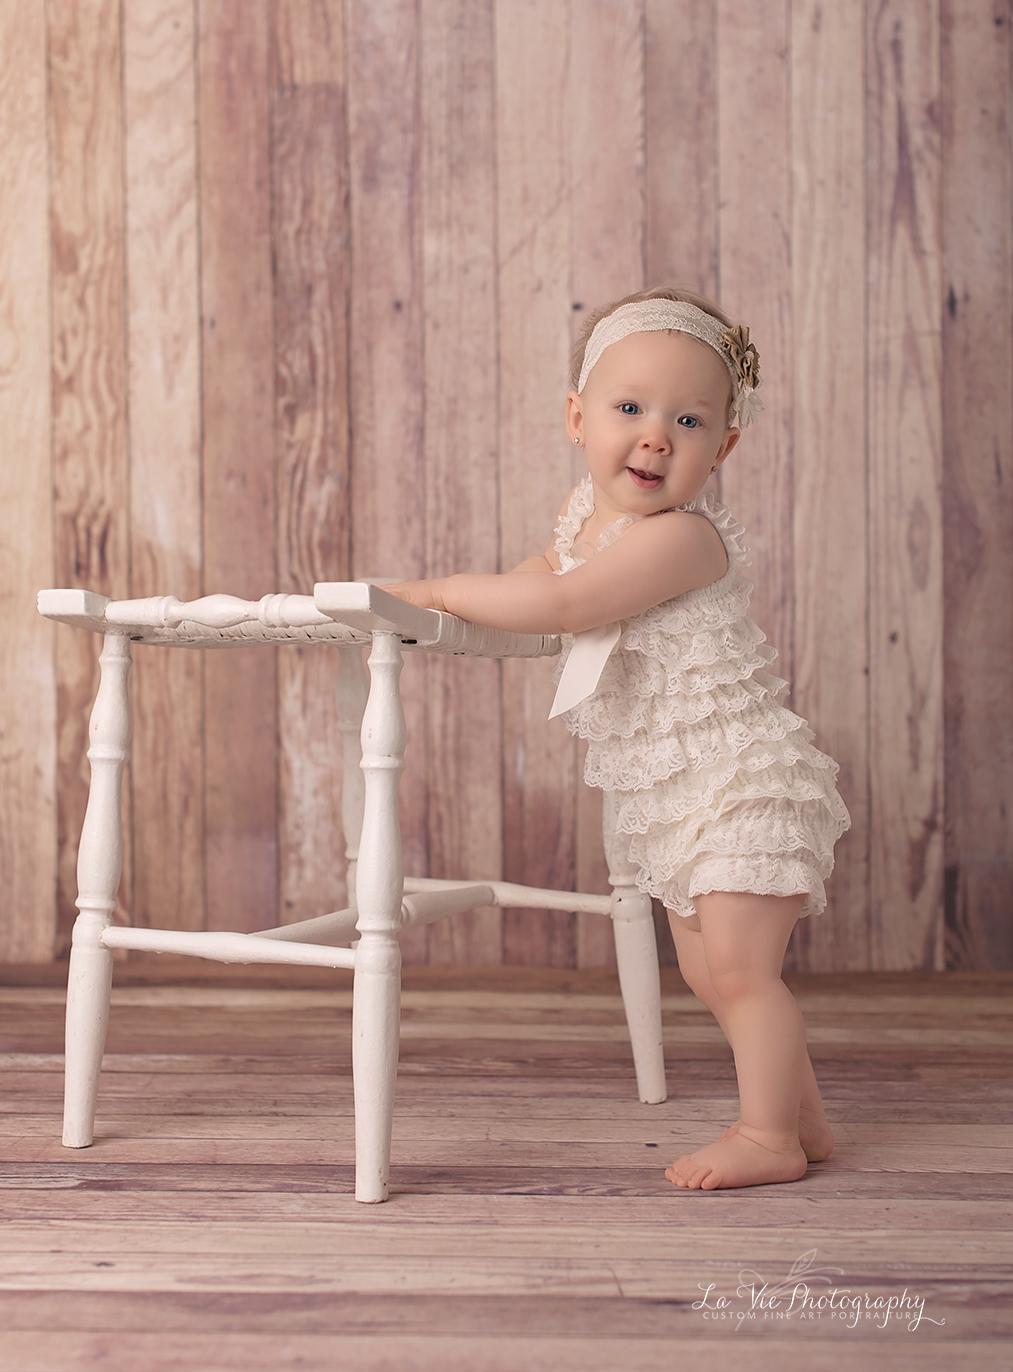 Baby Portraits - Houston, Tx